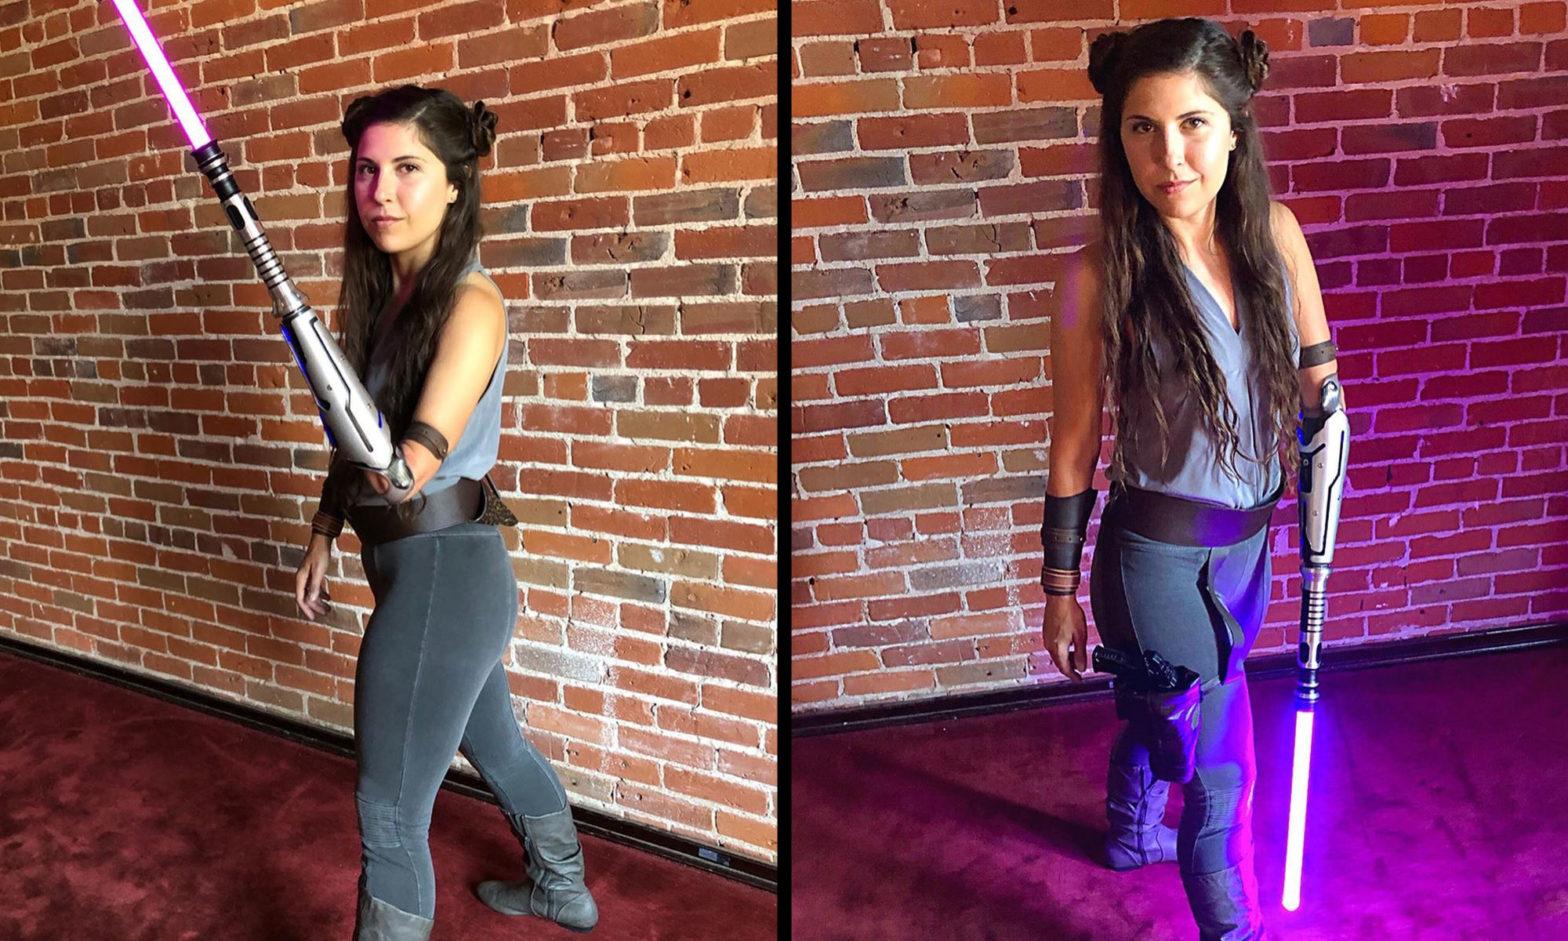 Angel Giuffria Bionic Arm Lightsaber Arm